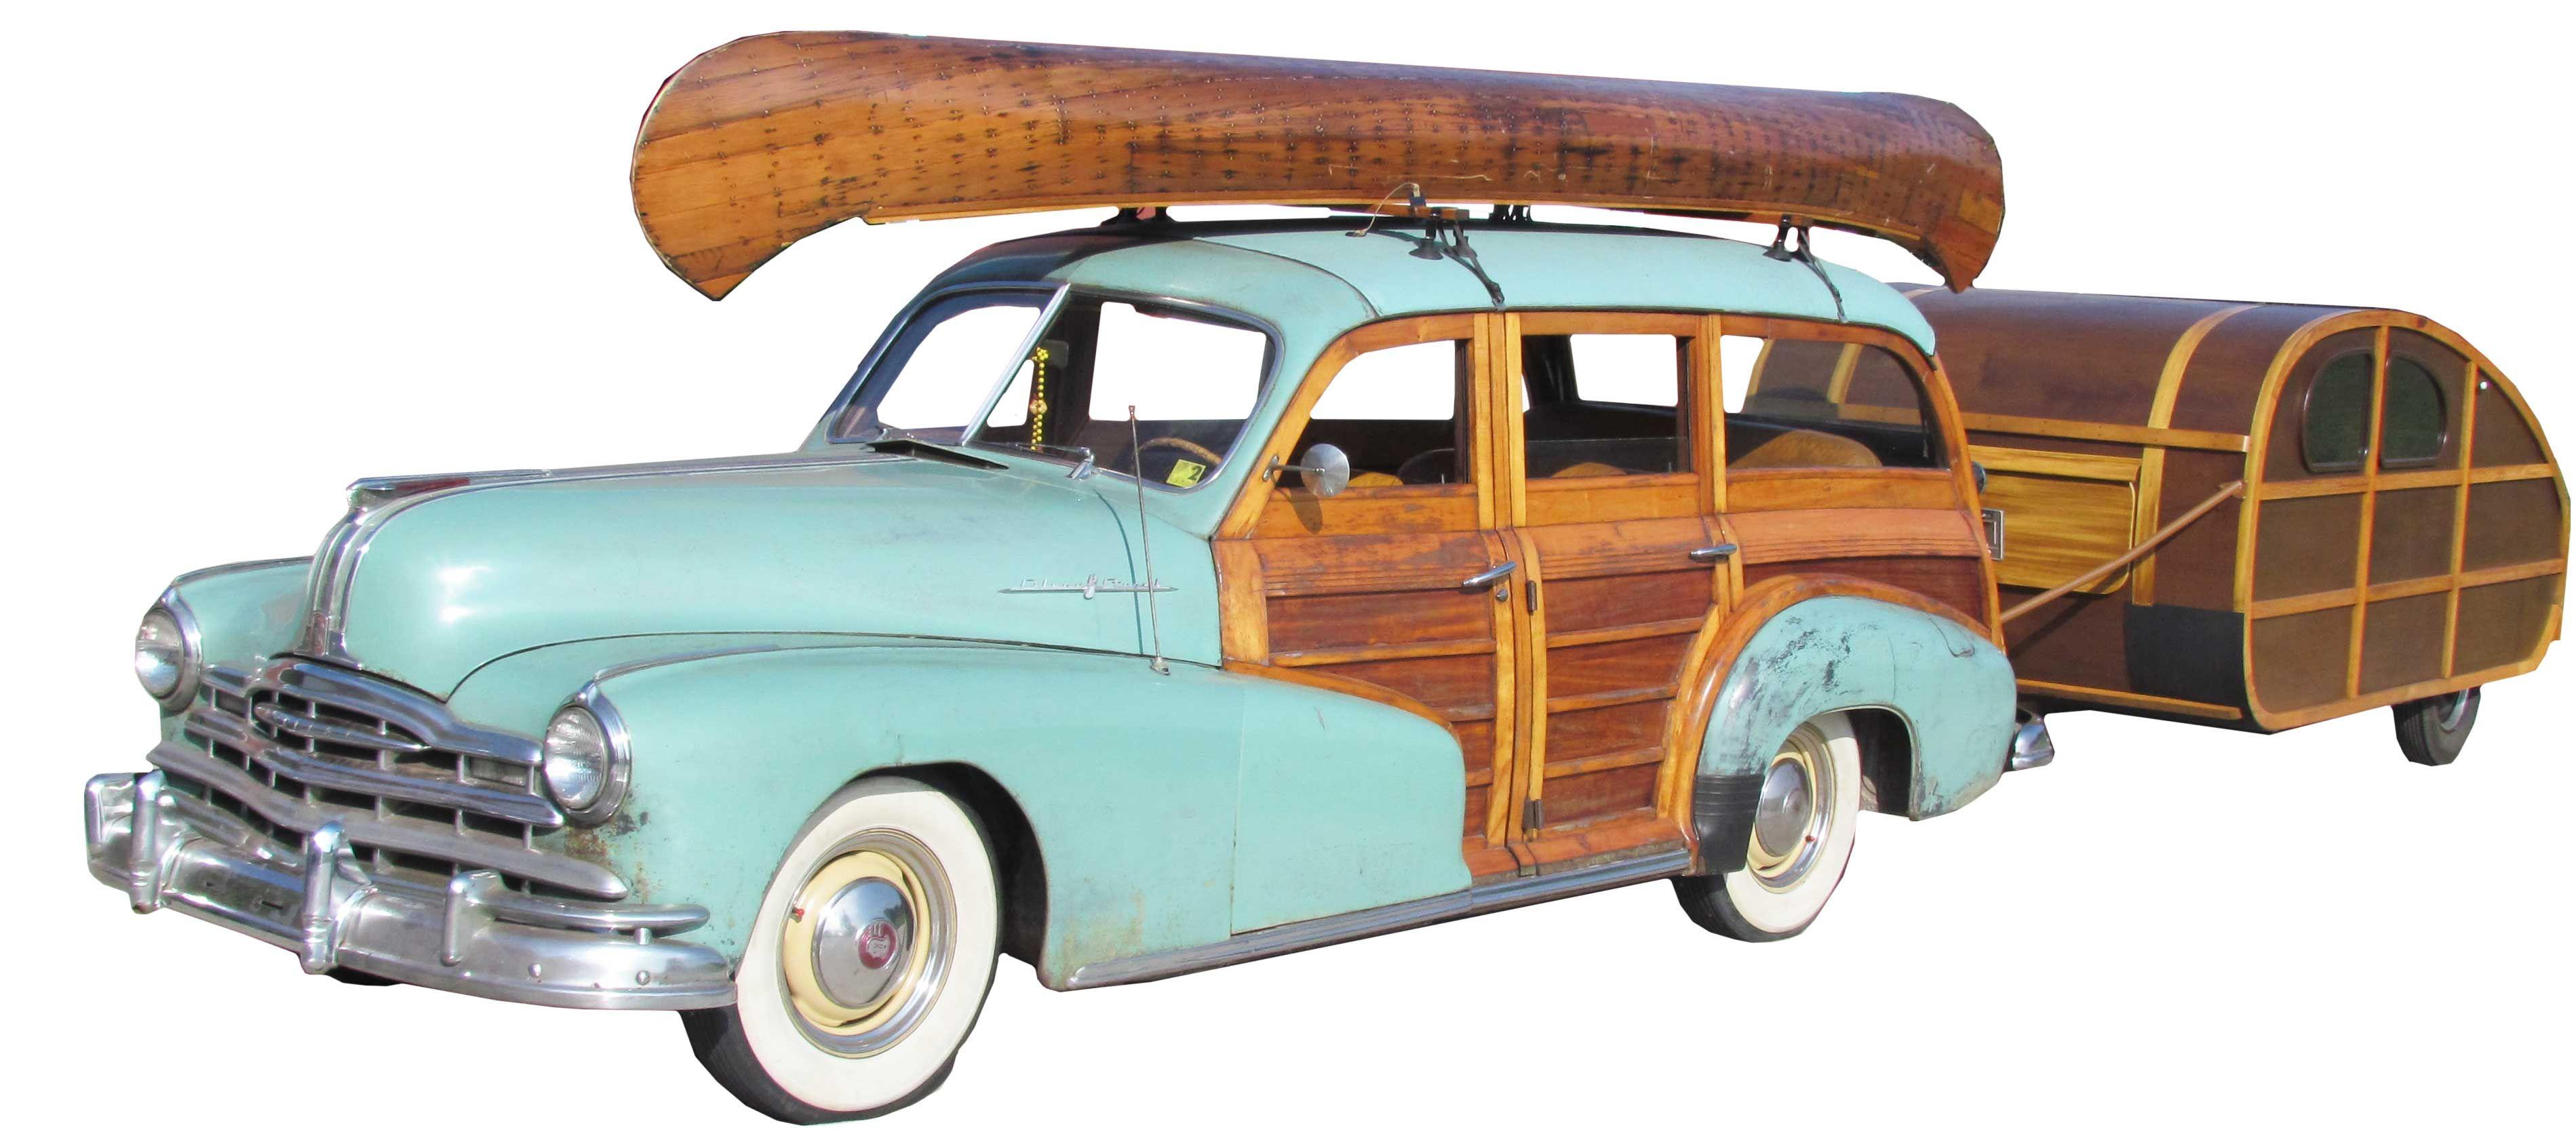 "A 1948 Pontiac ""Woody"" station wagon, 8cylinder, 4speed"